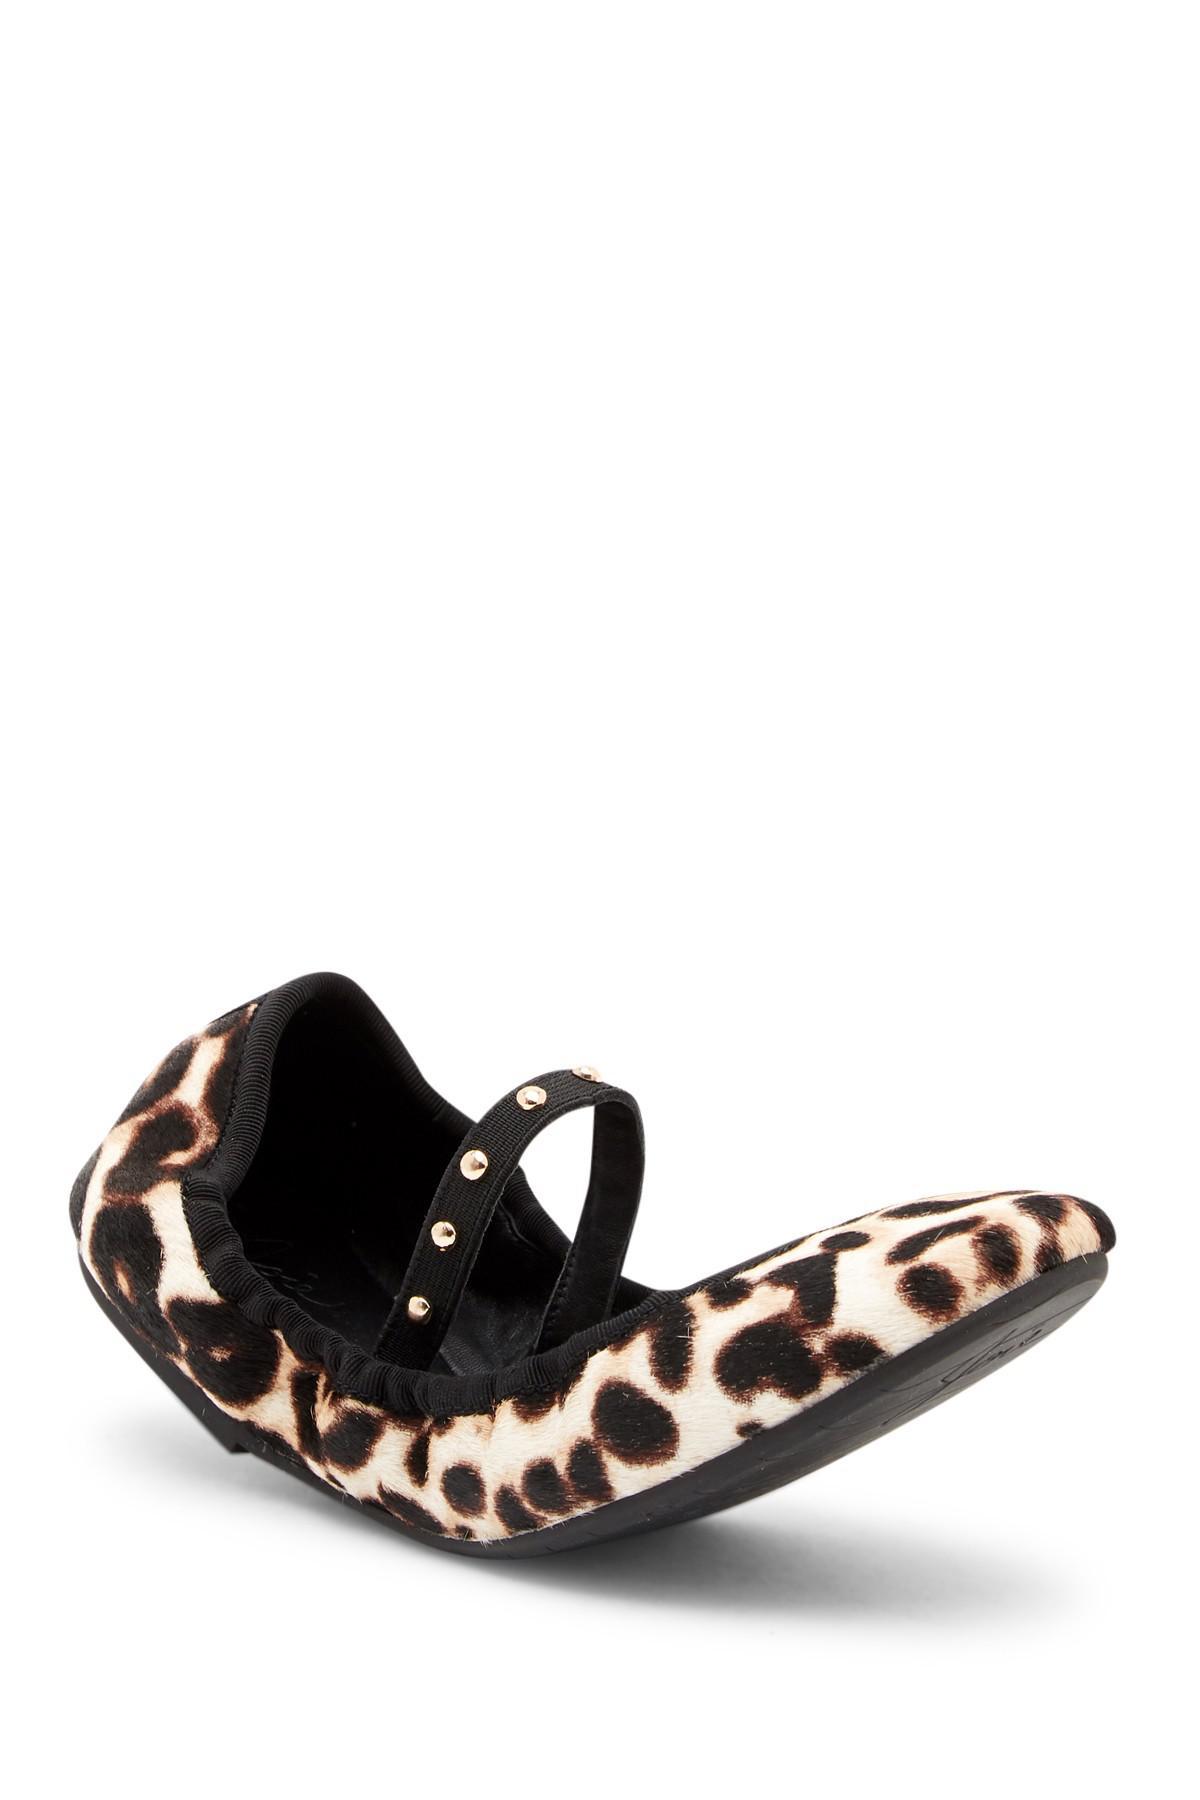 a3ab17fc3 Lyst - Joie Haddie Genuine Calf Hair Ballet Flat in Black